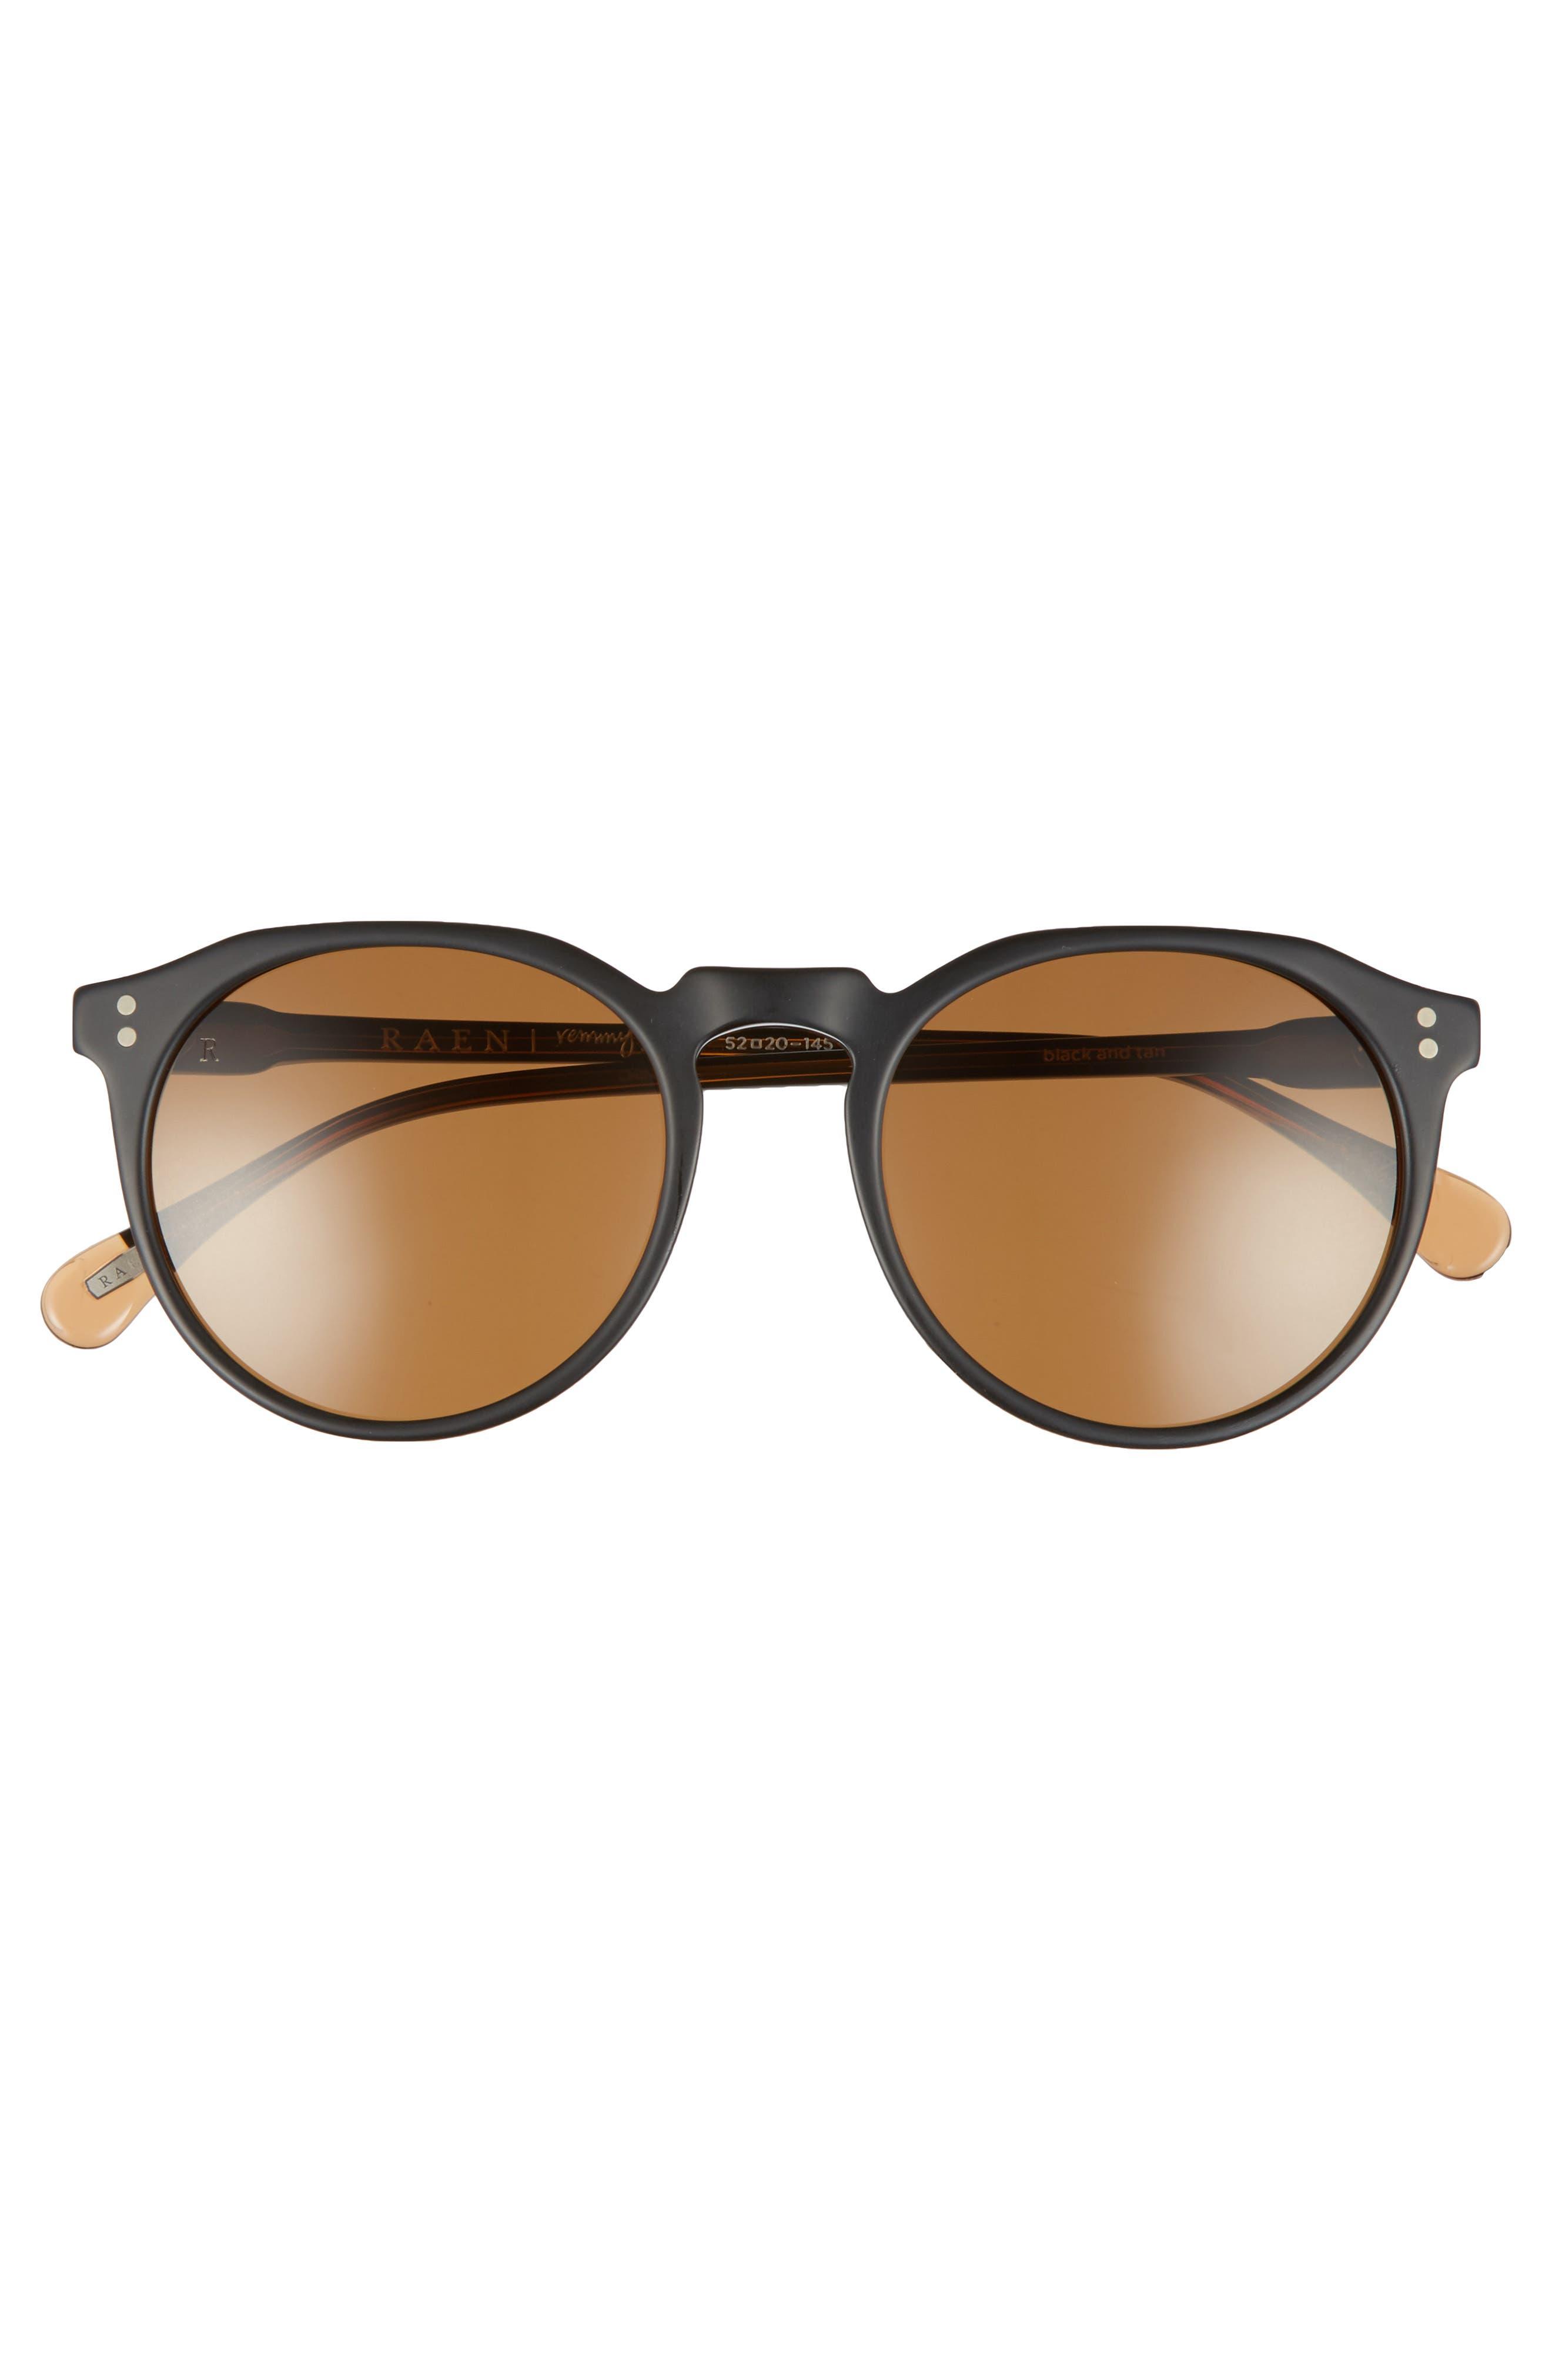 Remmy 52mm Sunglasses,                             Alternate thumbnail 2, color,                             BLACK/ TAN/ BROWN